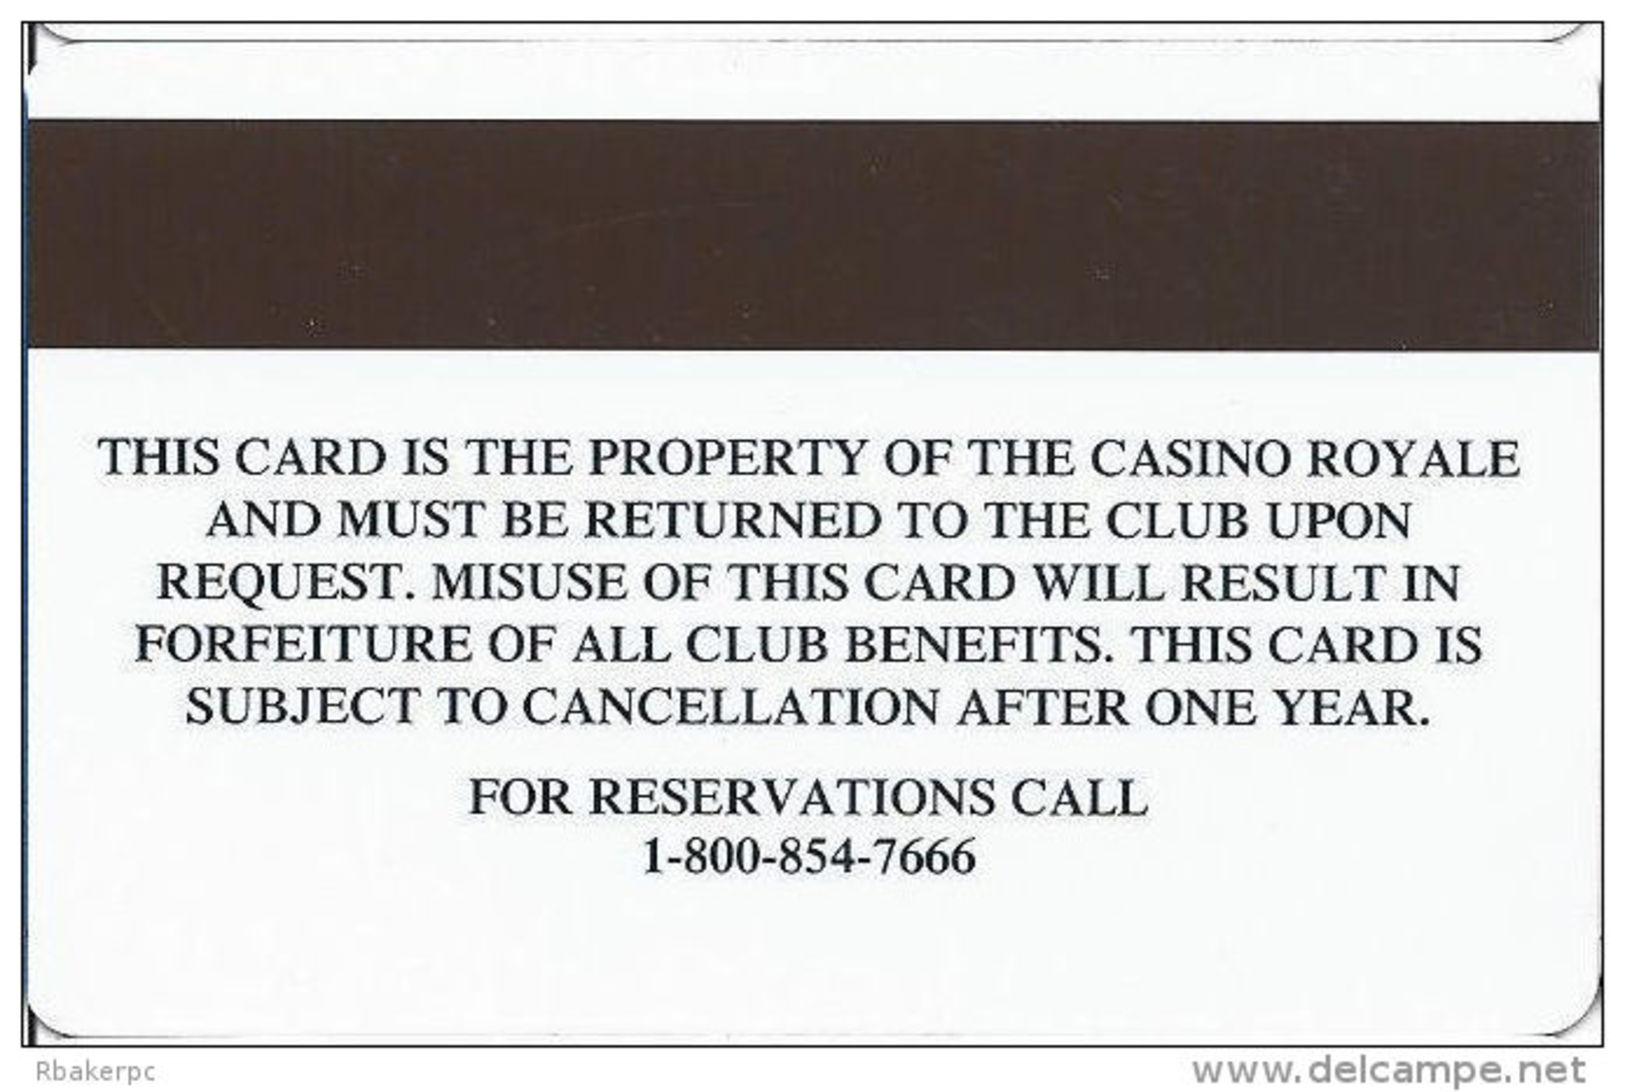 Casino Royale Las Vegas, NV - Slot Card - Casino Cards